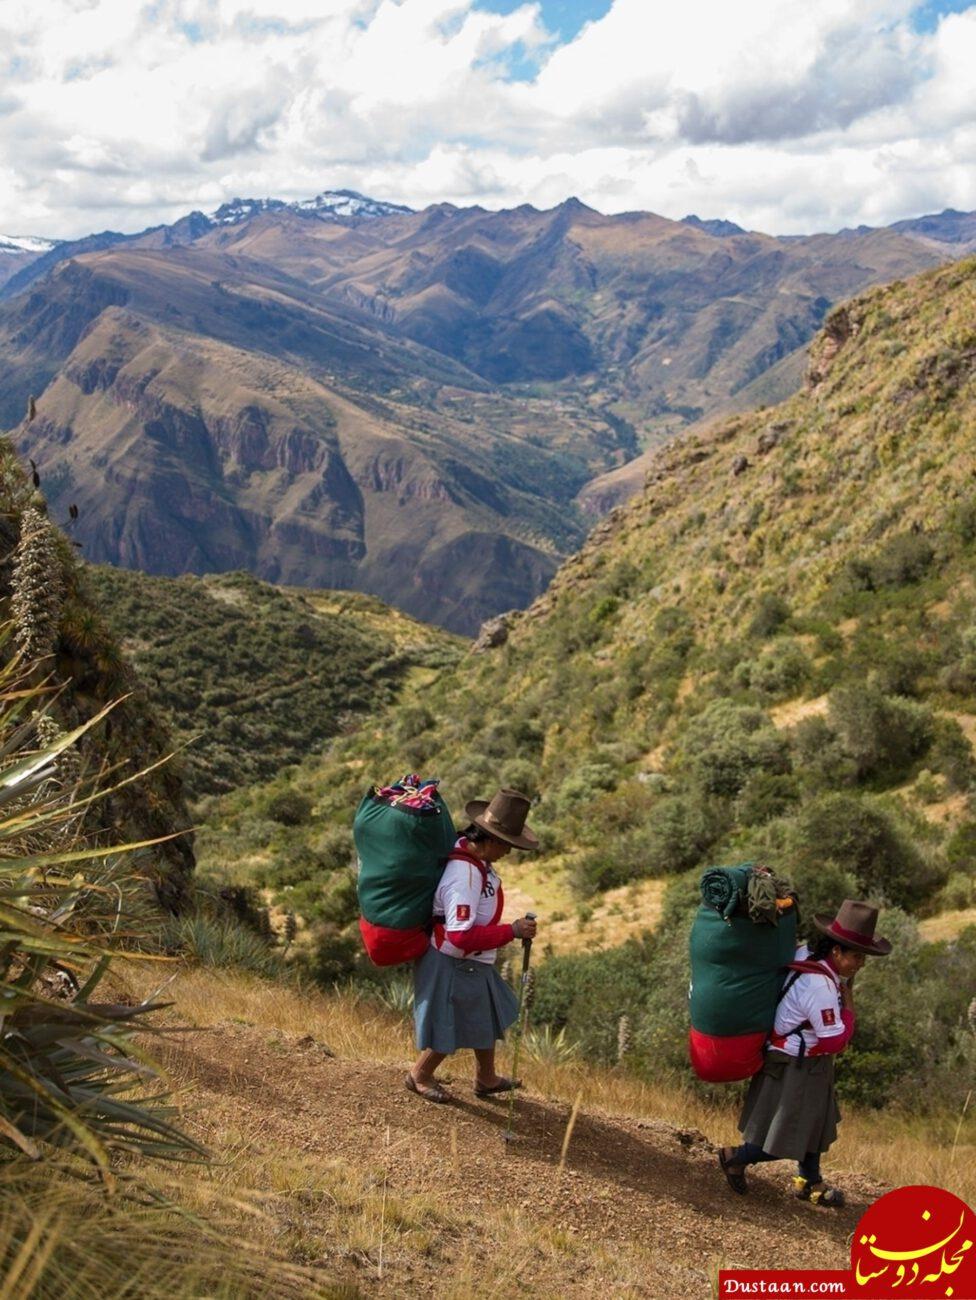 www.dustaan.com بارکشی زنان کوله بر برای گردشگران خارجی +عکس